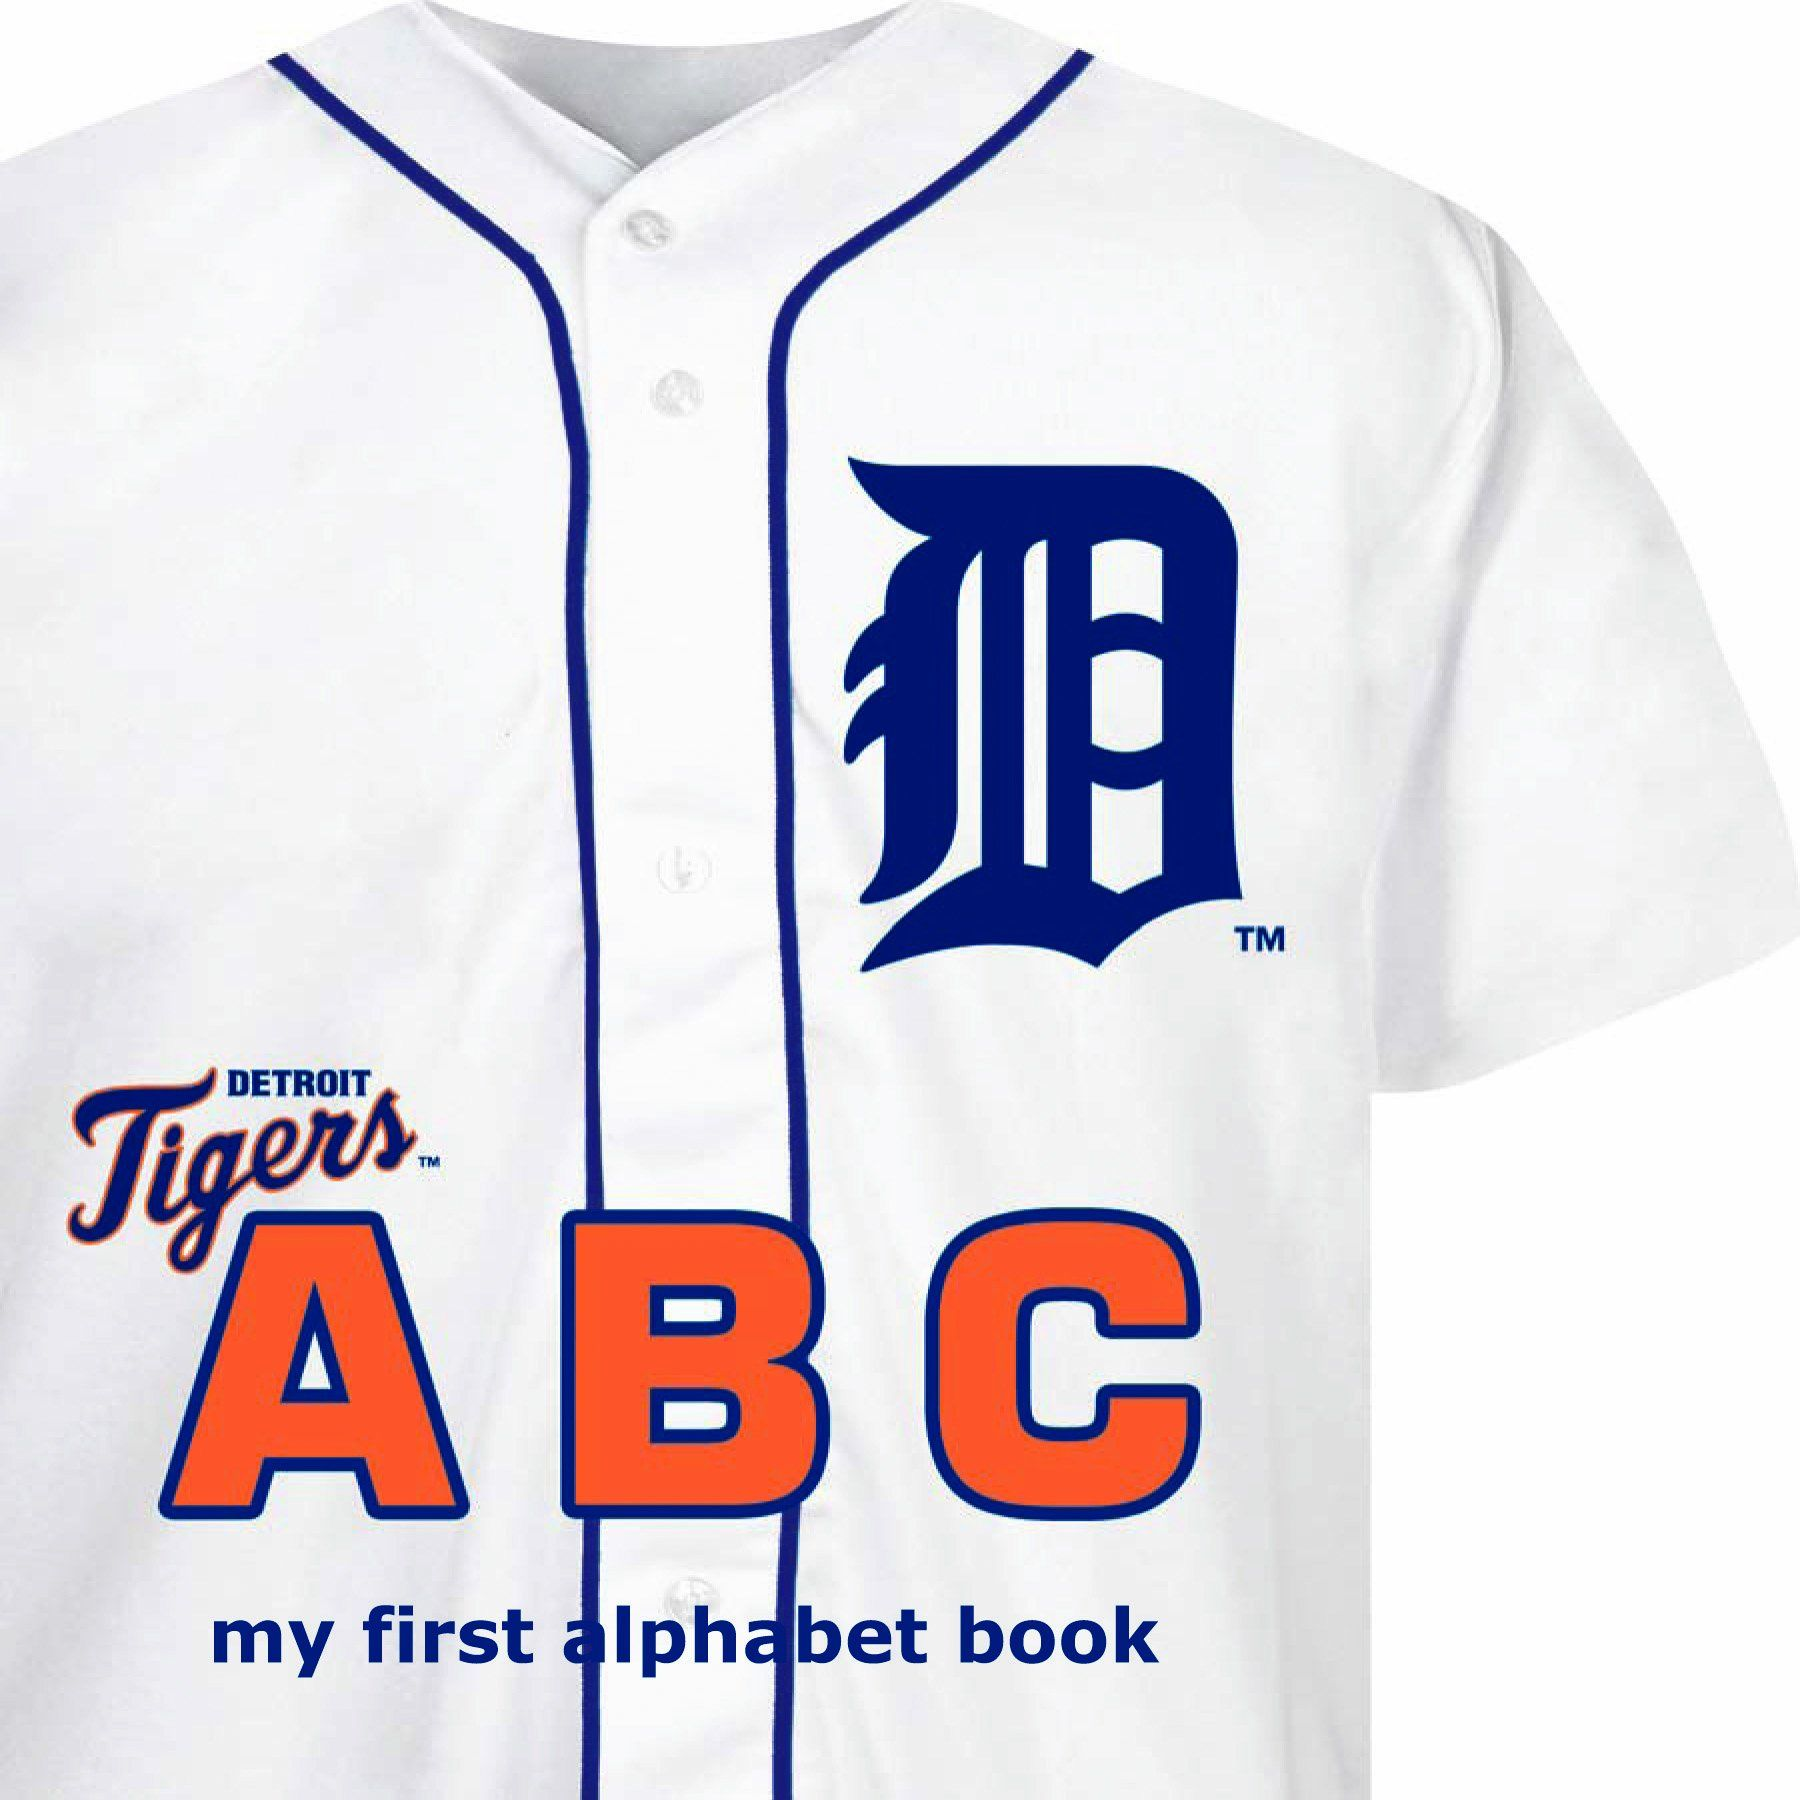 Detroit Tigers Abc My First Alphabet Books Michaelson Entertainment Brad Epstein 9781607300137 Amazon Com Books Mom Detroit Tigers Mlb Detroit Tig